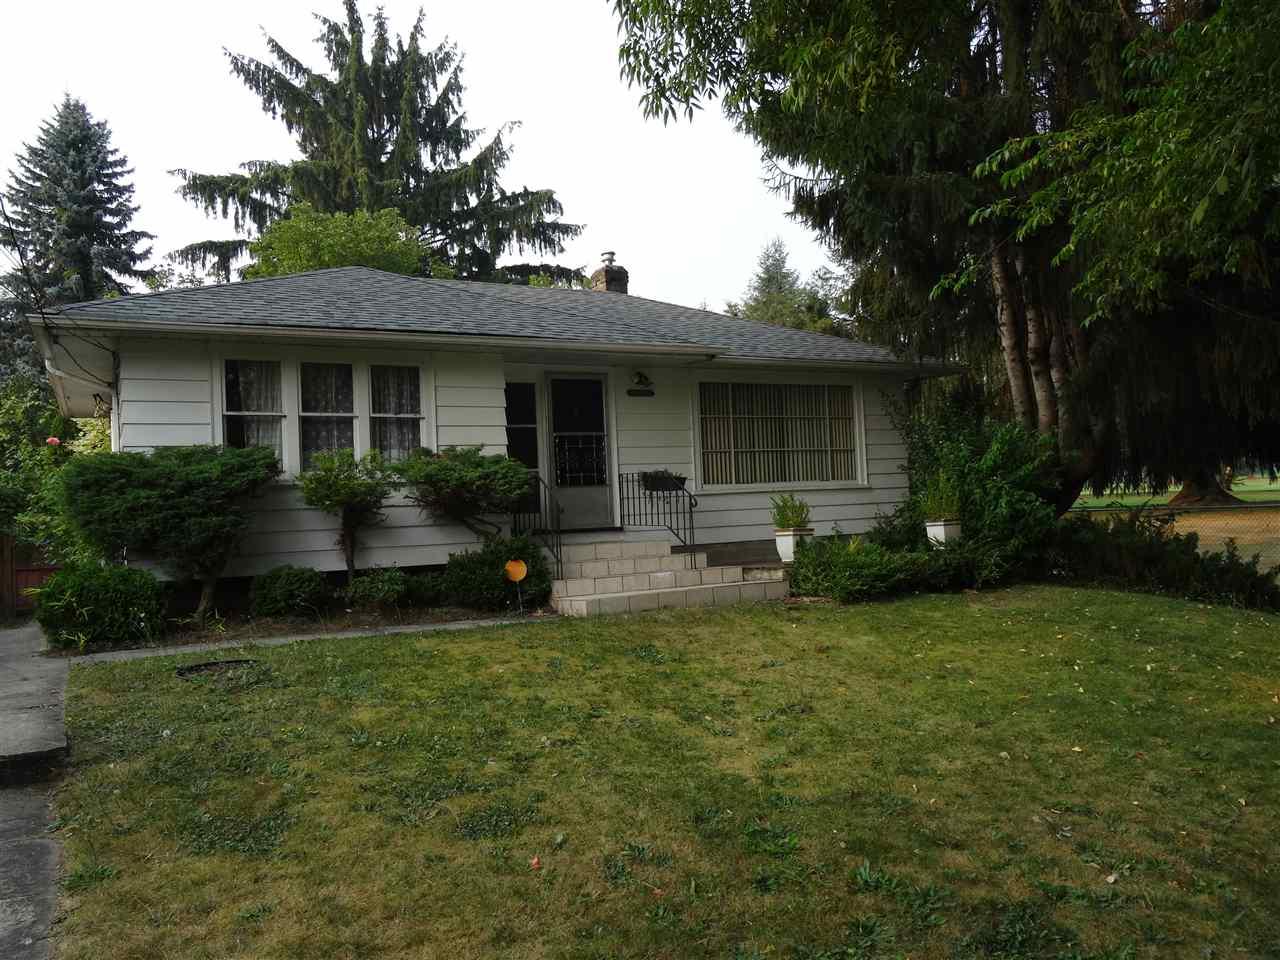 20761 113 AVENUE, Maple Ridge